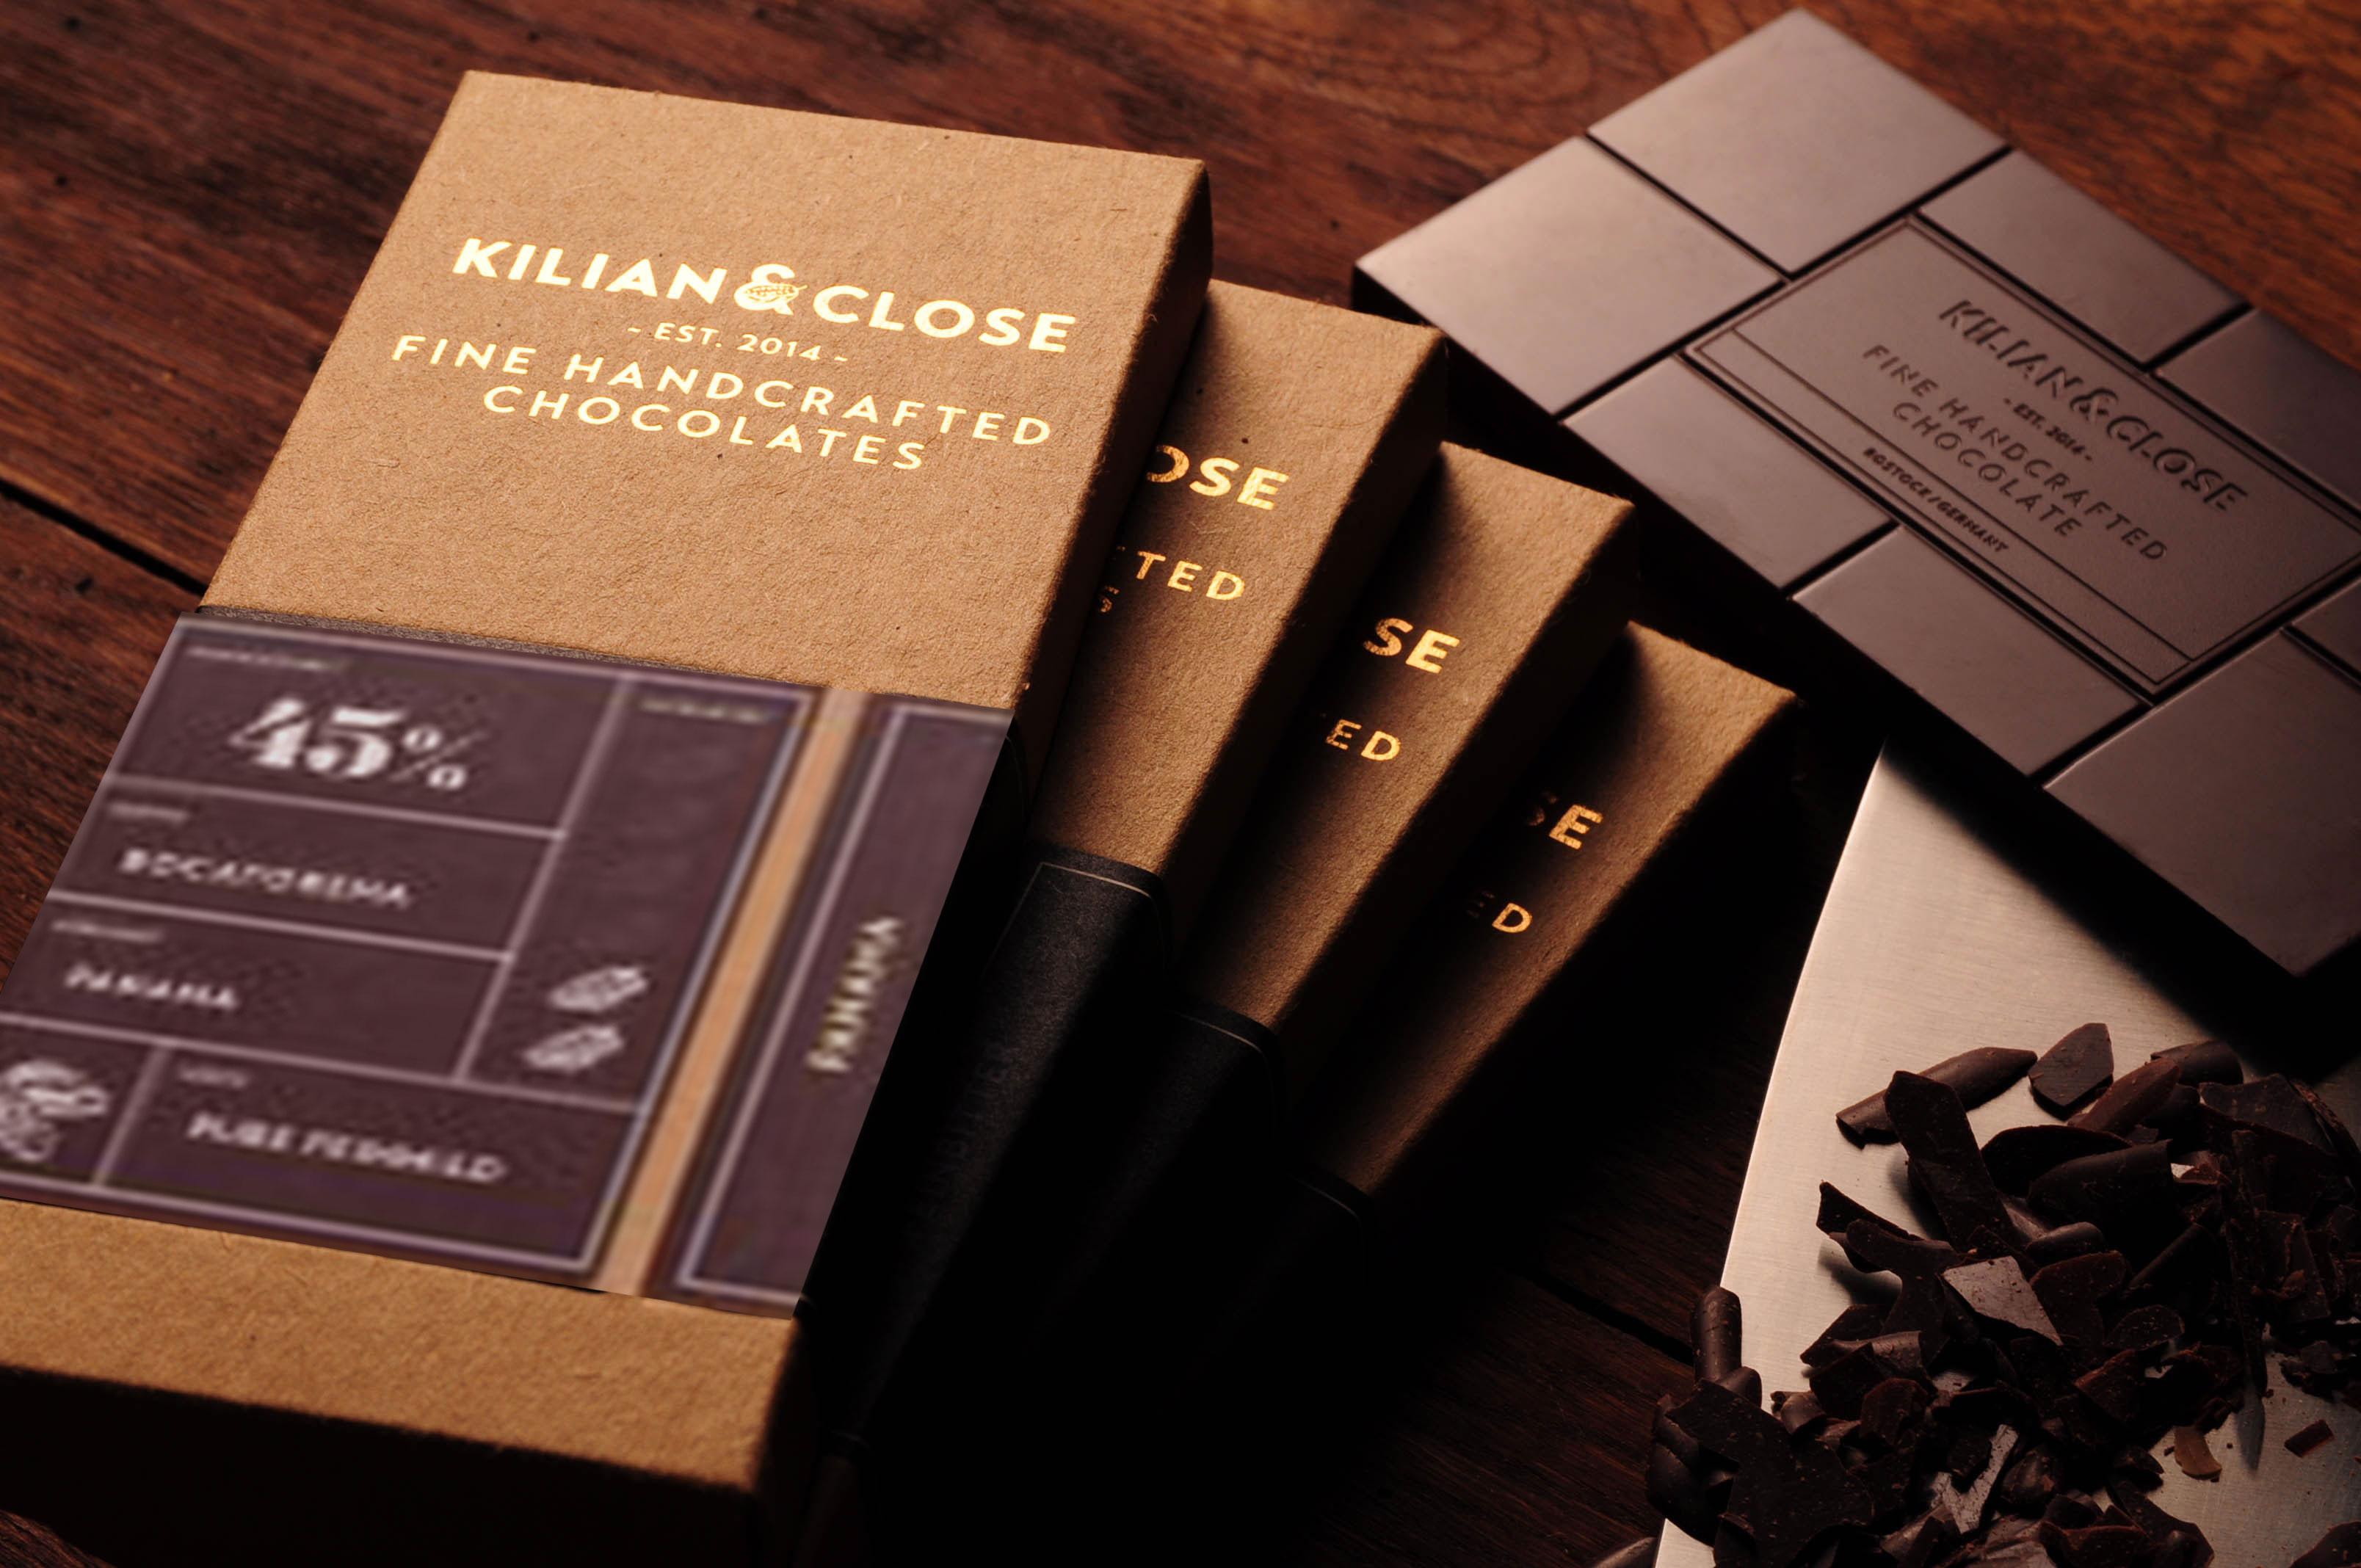 KILIAN & CLOSE | Schokolade mit gerösteten Kakaonibs 48% | BIO